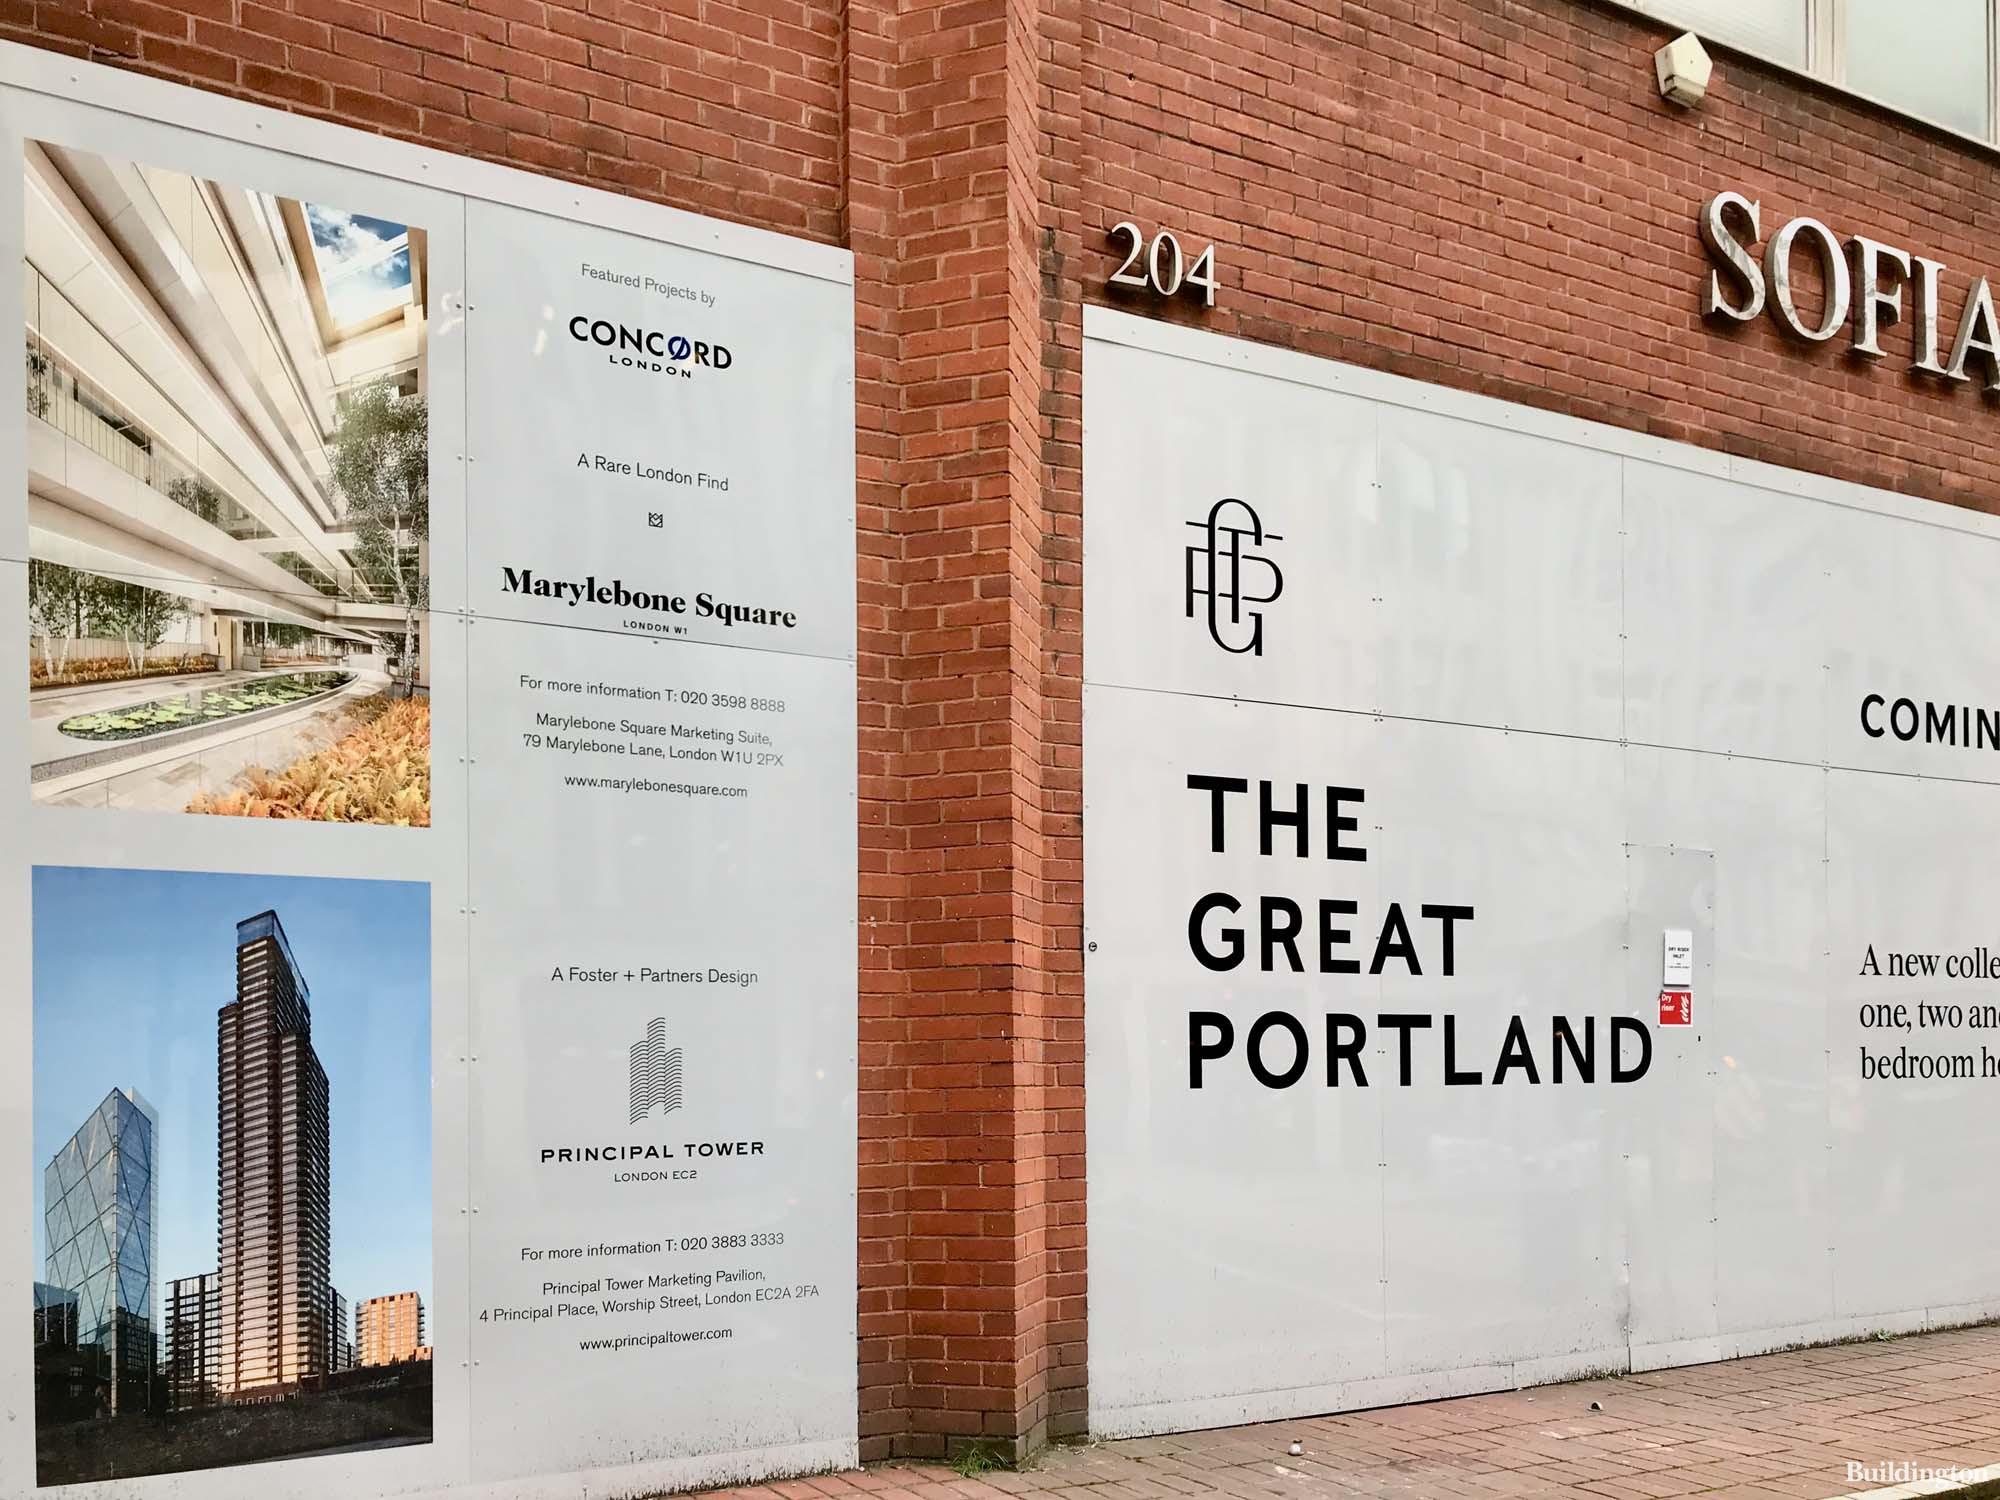 W1 Place development will offer 37 new build homes on Great Portland Street in Marylebone, London W1.